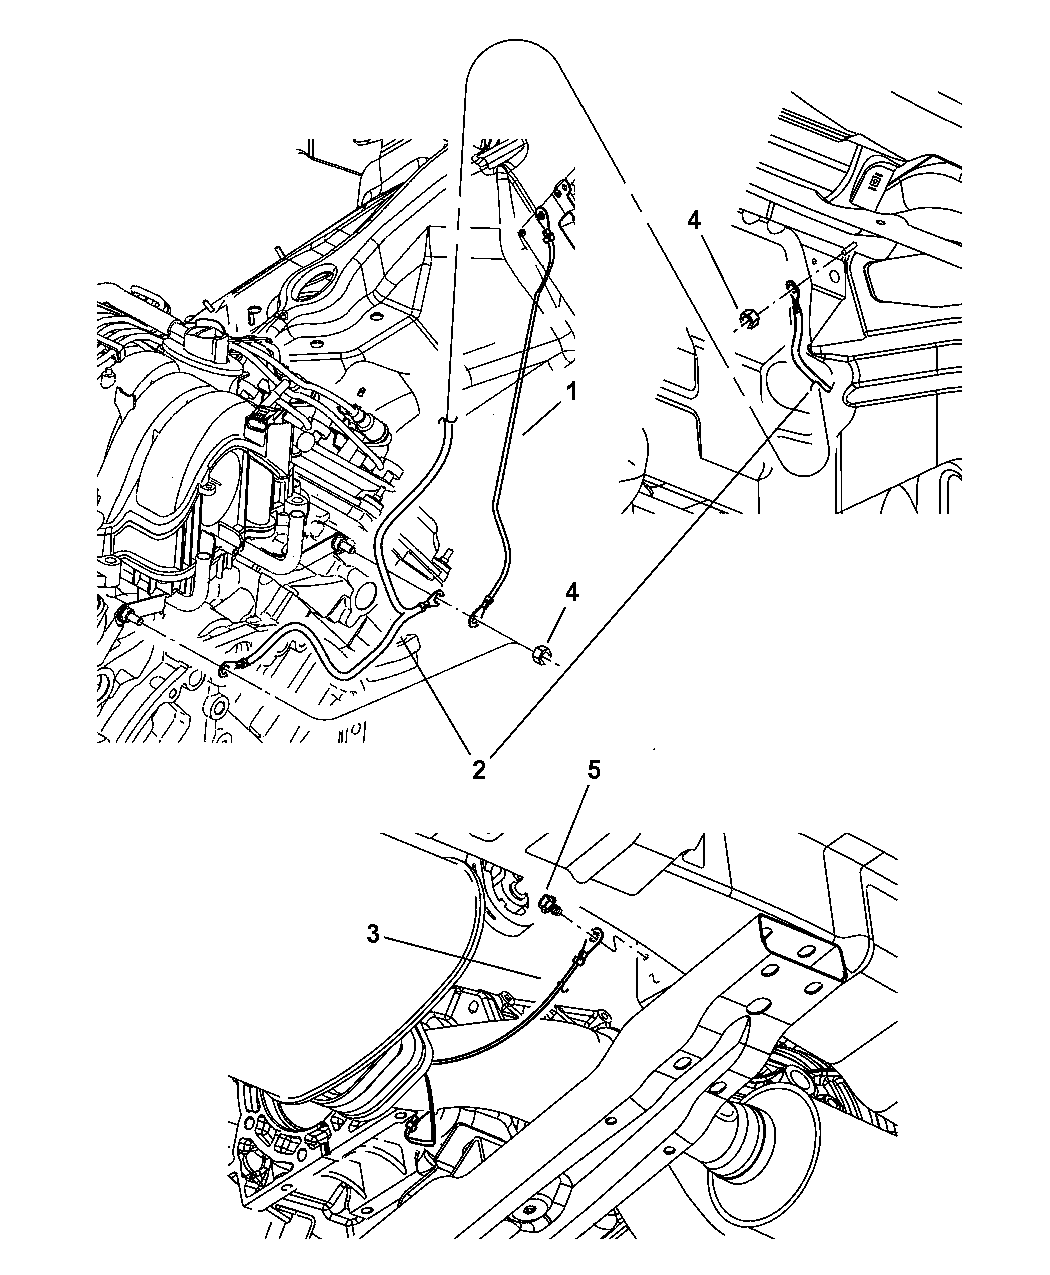 2006 jeep grand cherokee ground straps-engine